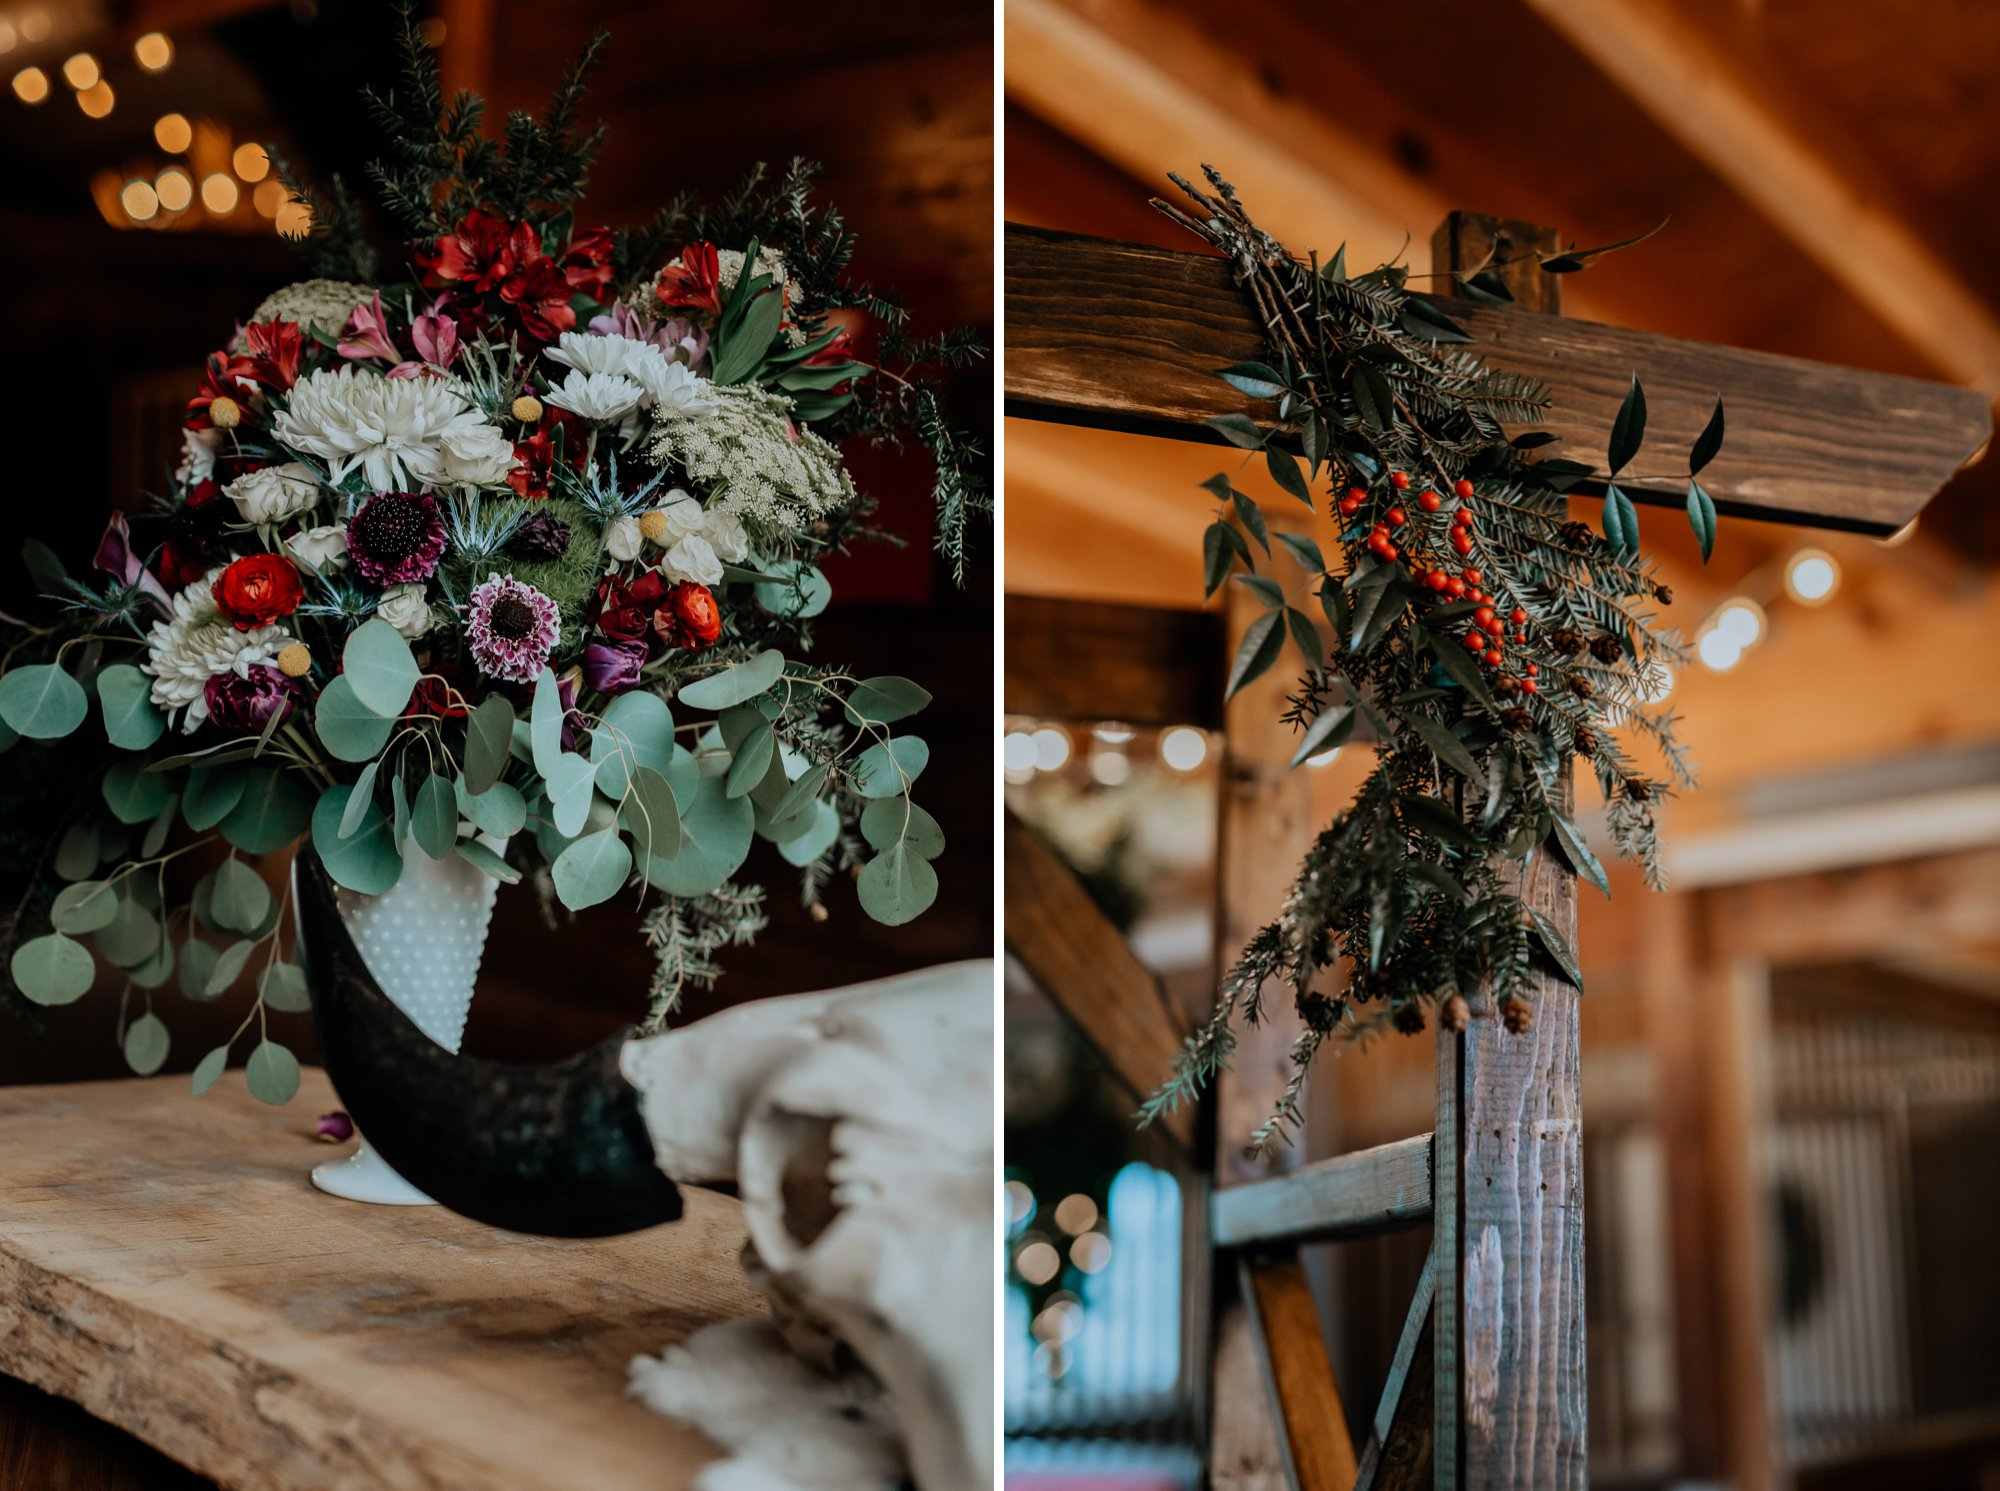 Richmond VA RVA Countryside Winter Wedding Bandits Ridge Lush DIY Florals Snowy Portraits_38.jpg